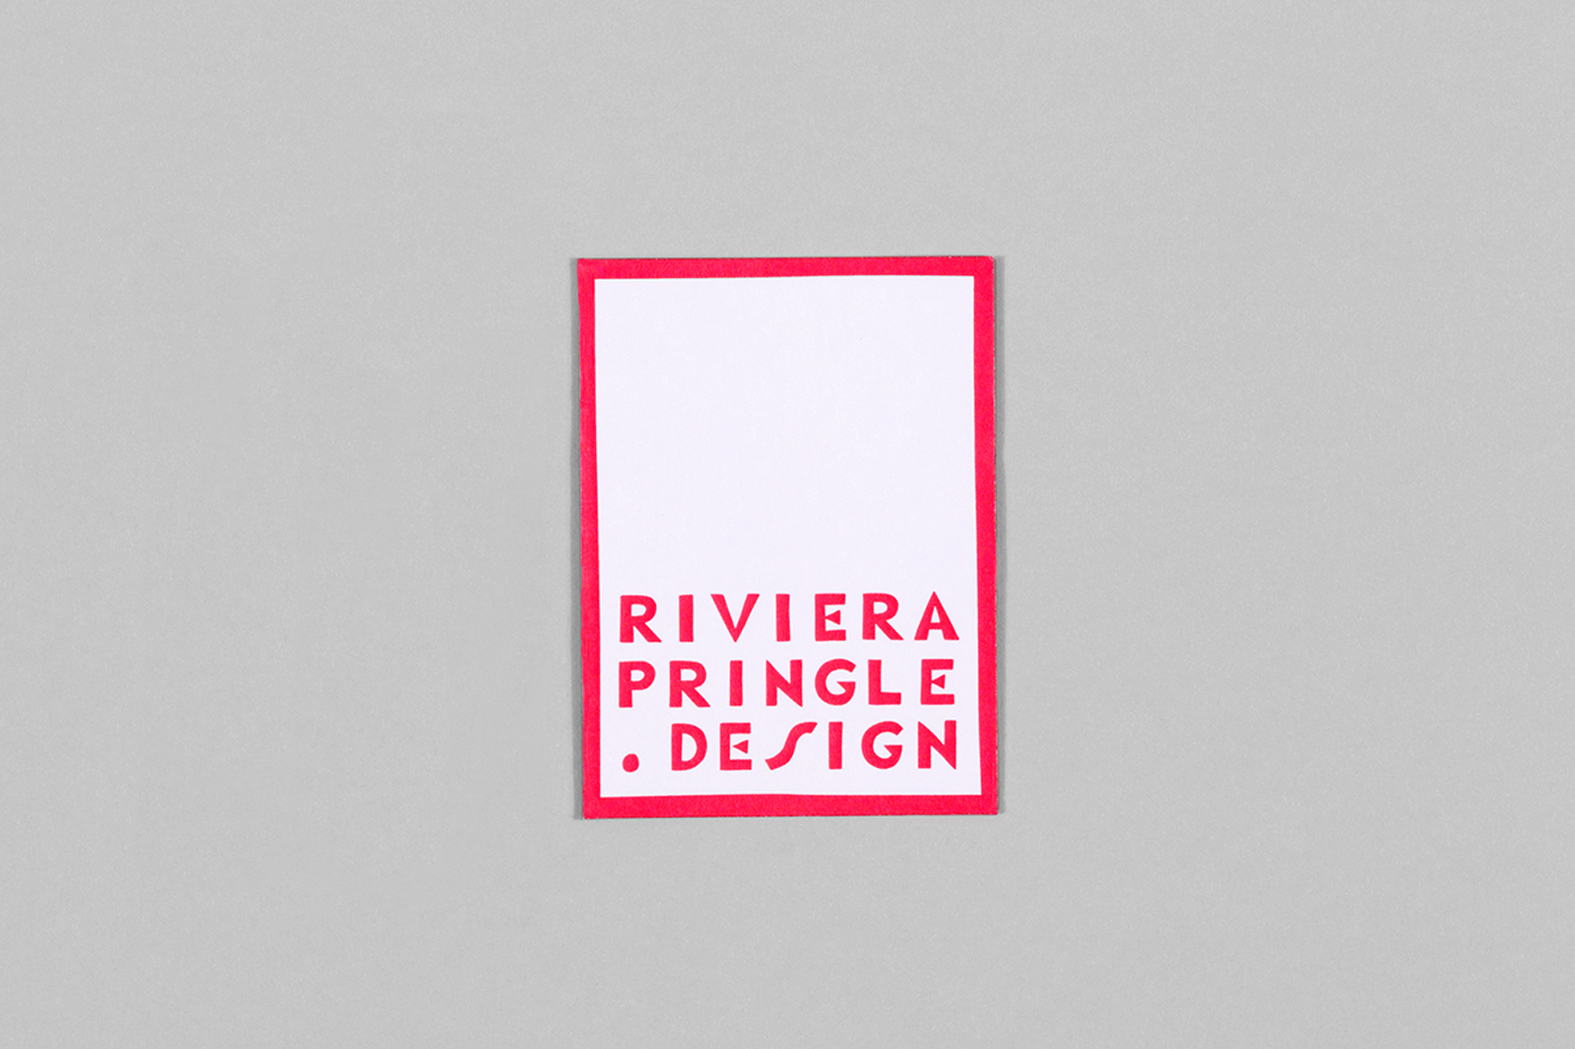 StudioEger_2018_RivieraPringle_WebReady1.jpg